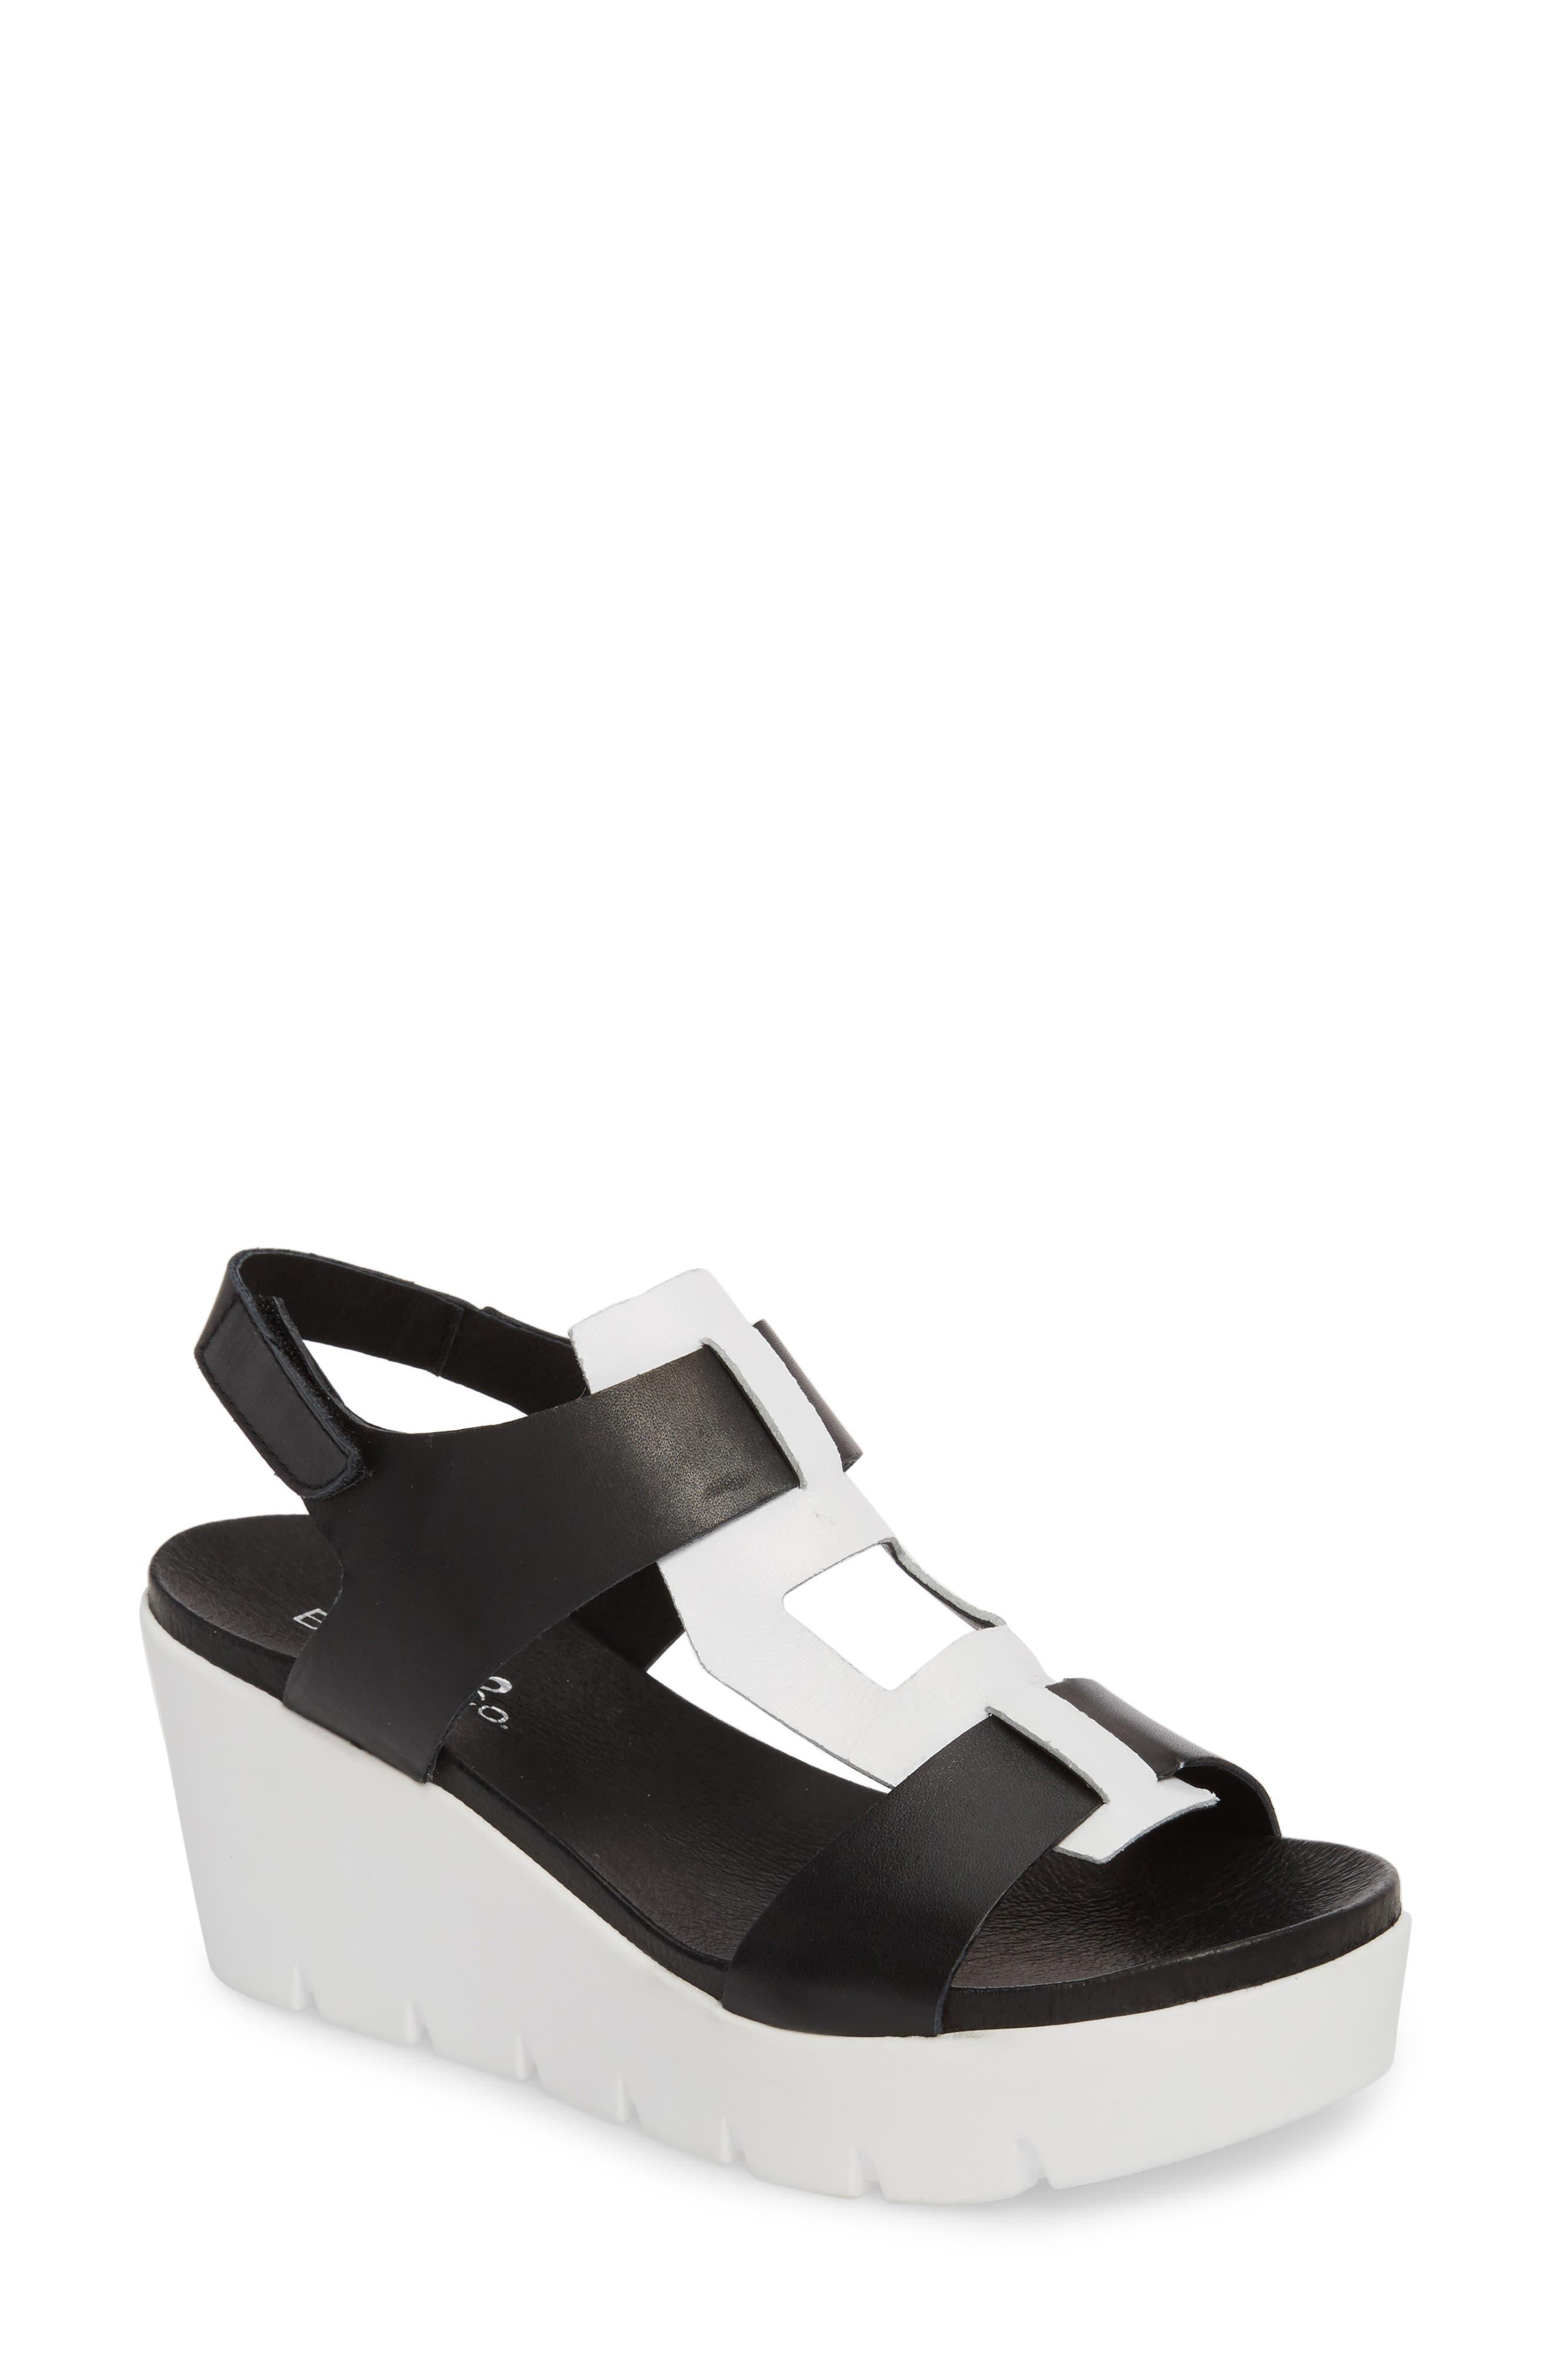 Somo Platform Wedge Sandal,                         Main,                         color, BLACK/ WHITE SMOOTH LEATHER